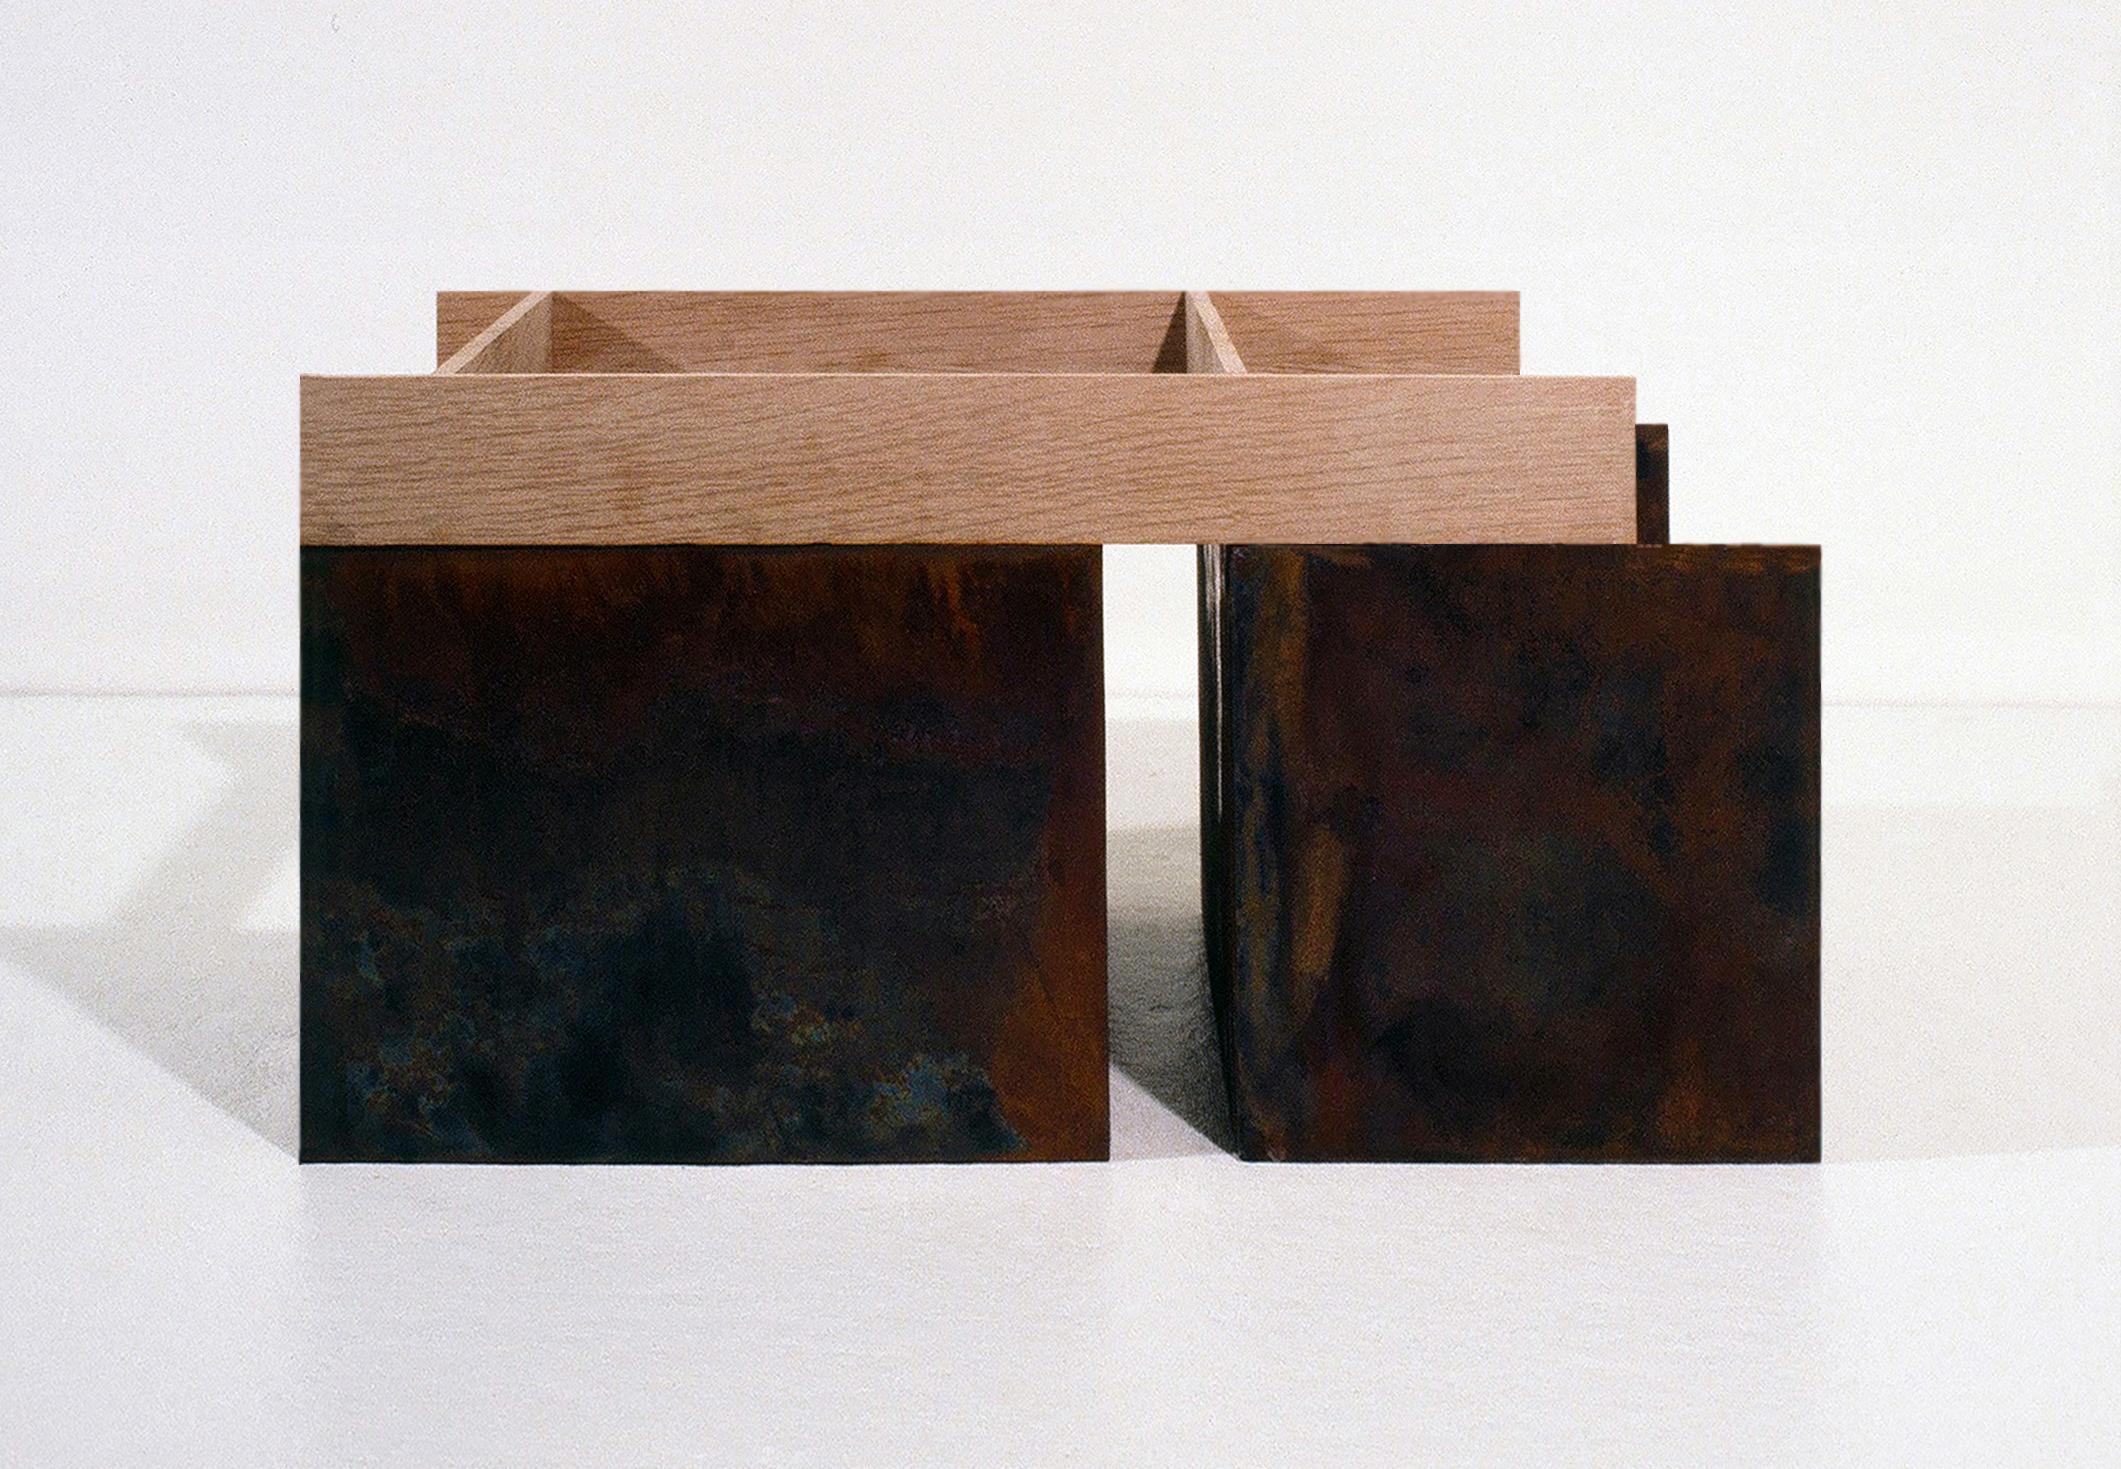 1978, Corten steel, oak, 10.5 x 22 x 12 inches.